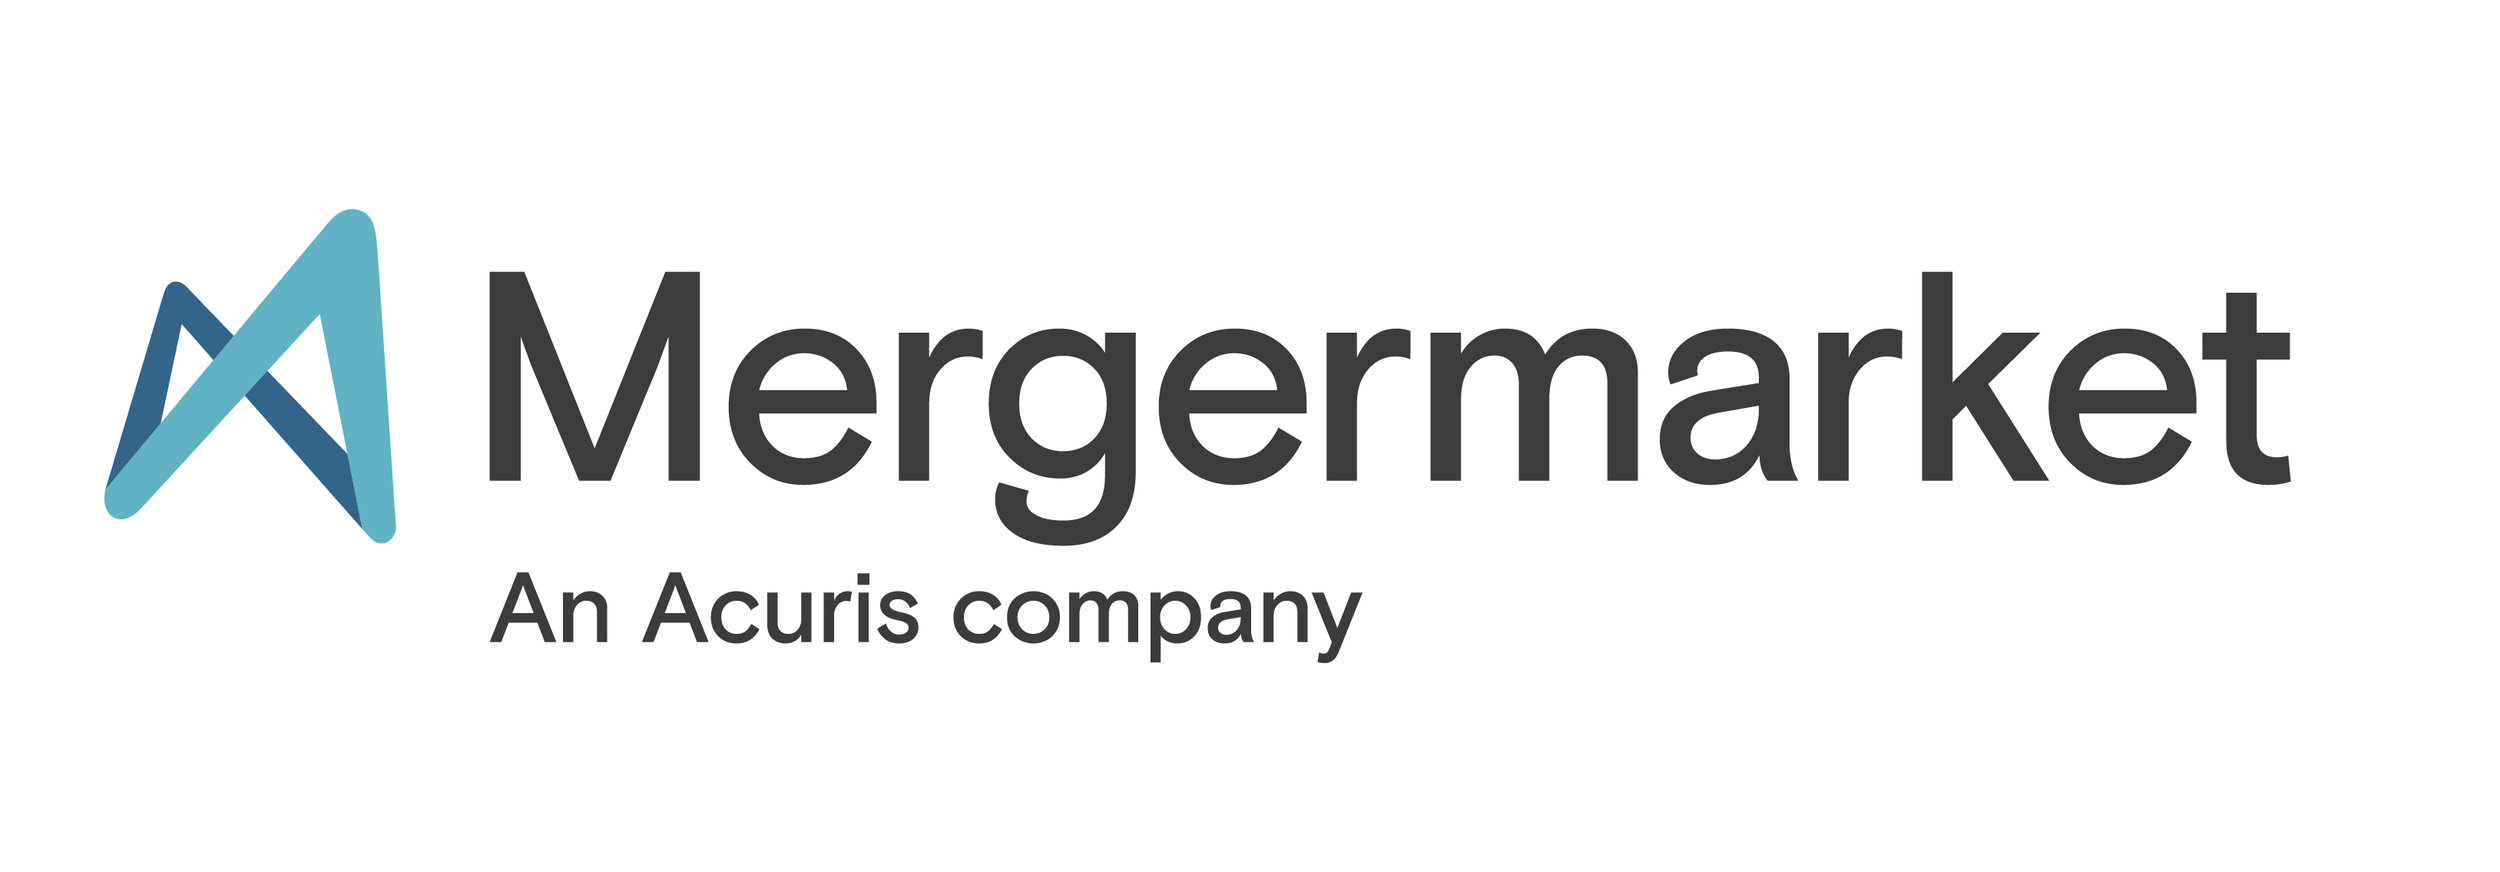 https://www.mergermarket.com/info/